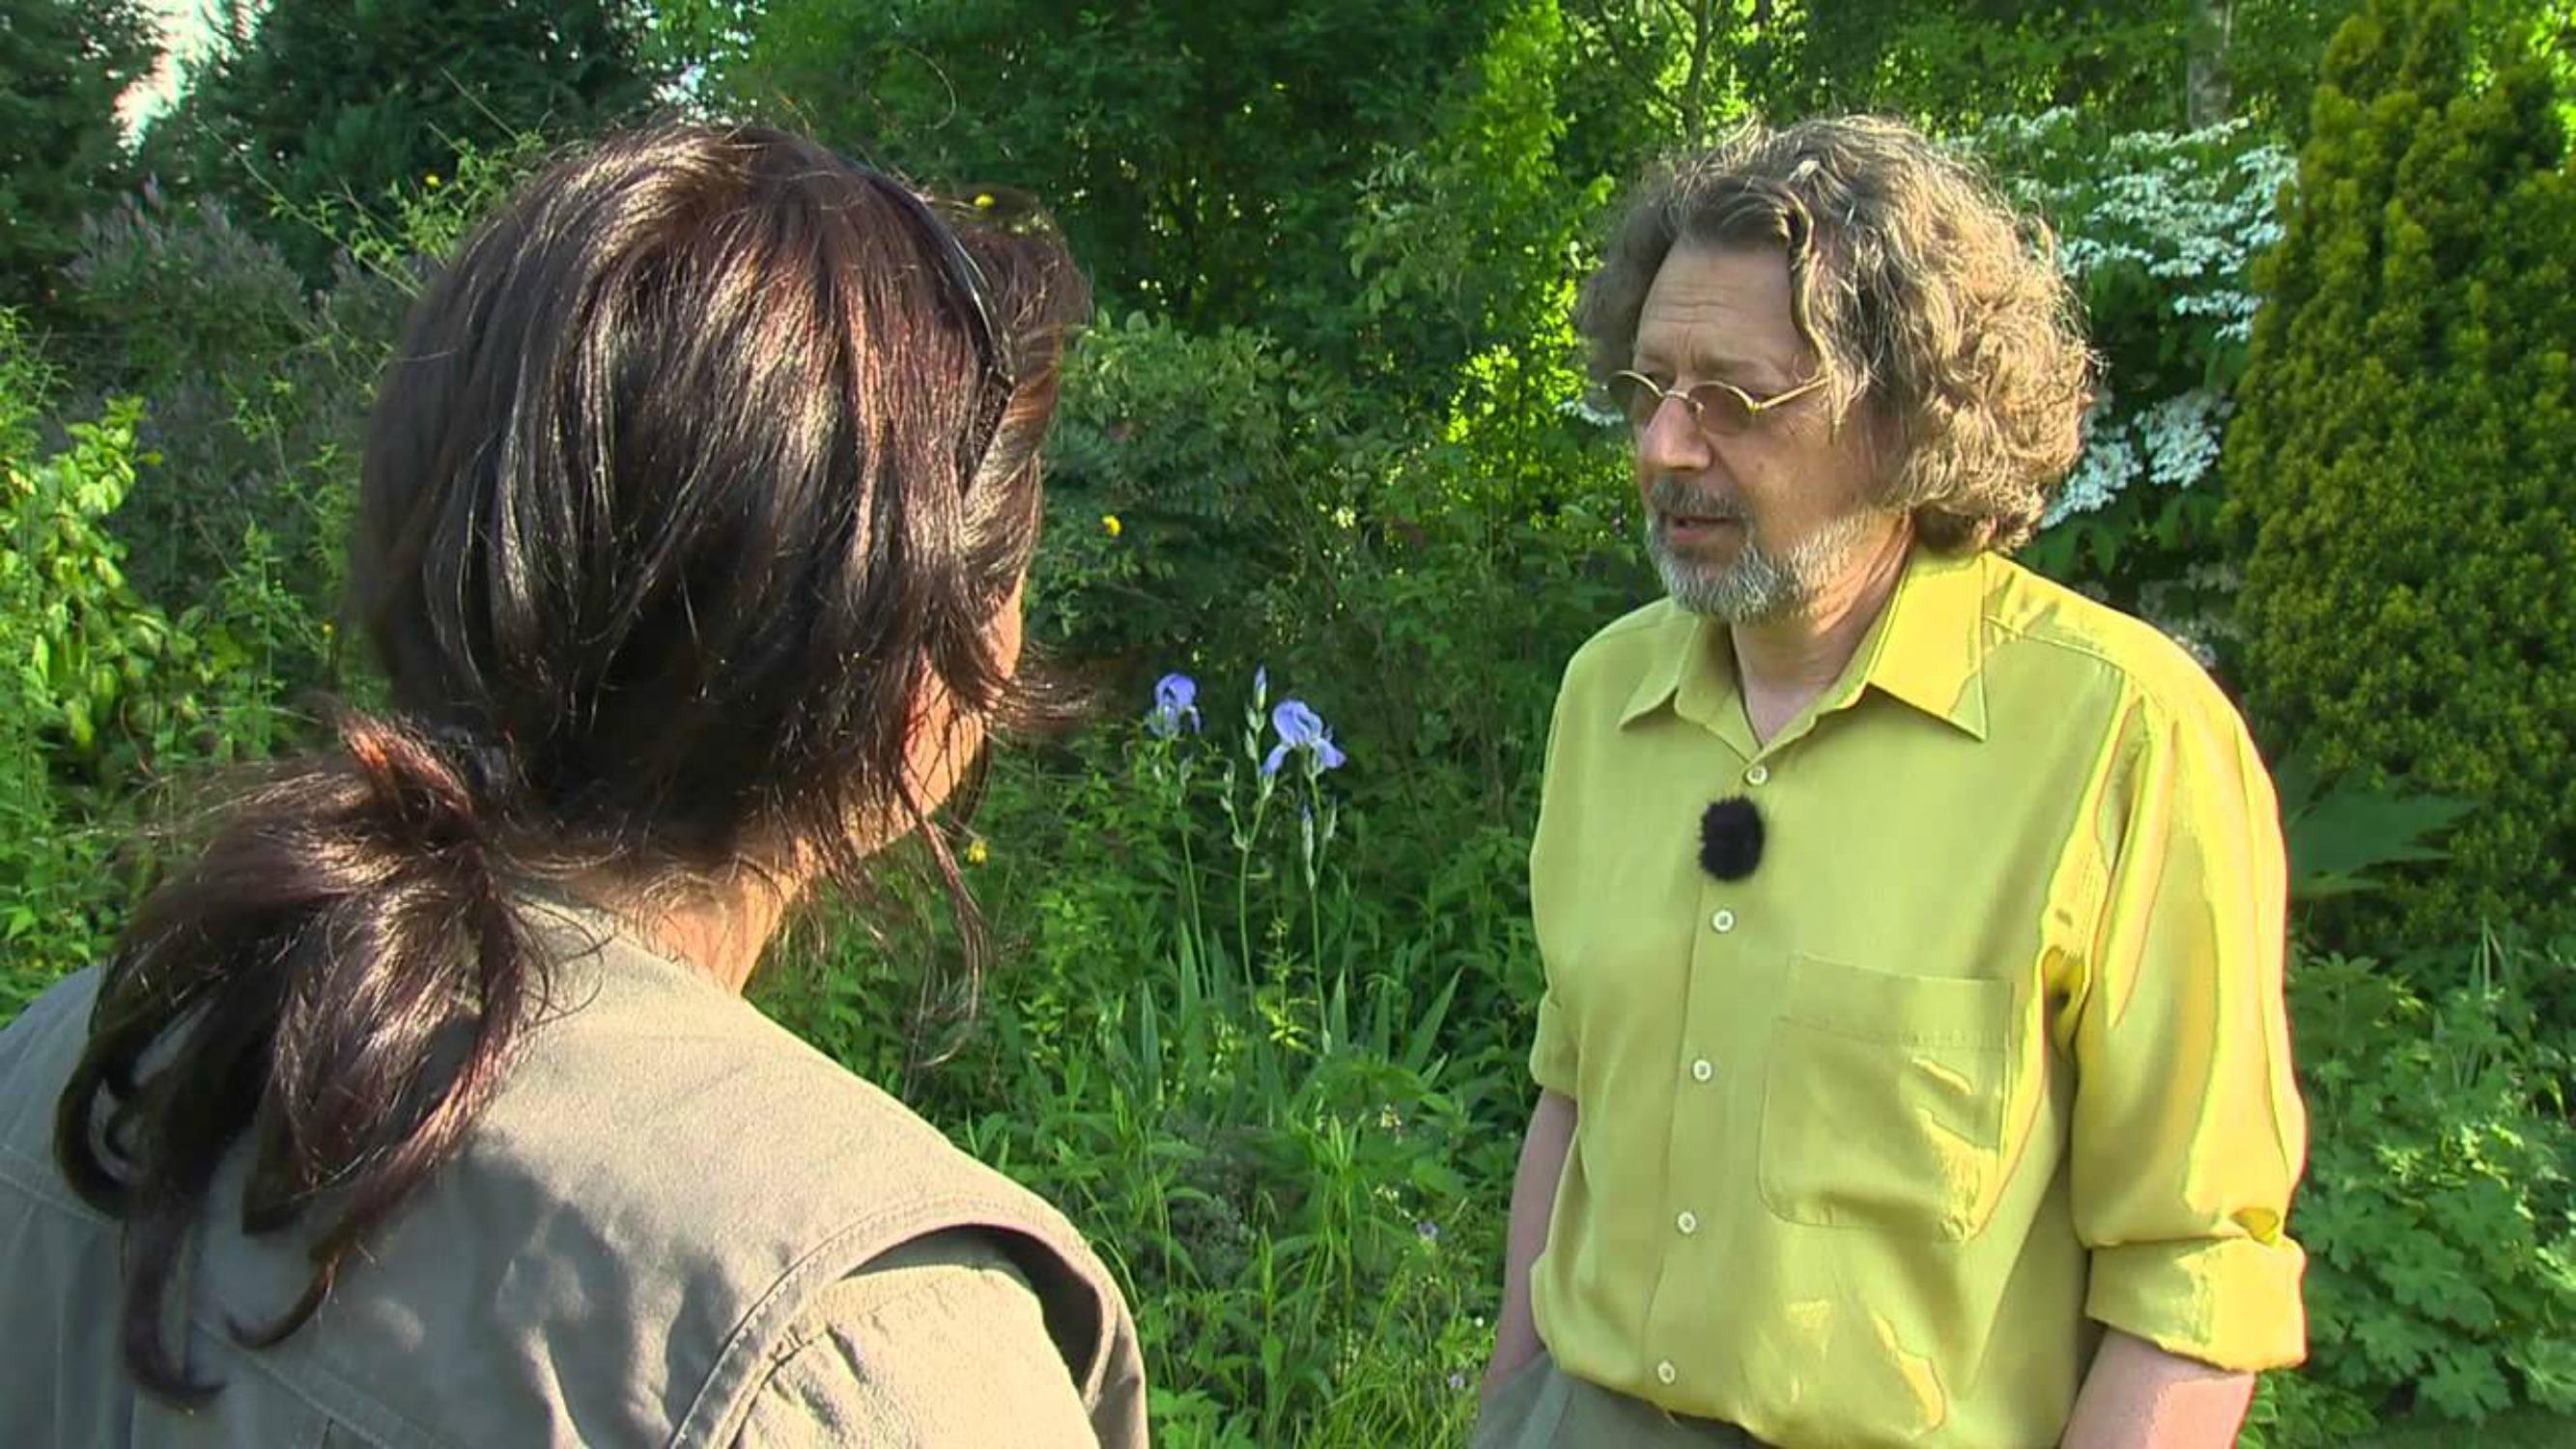 Un jardin en Picardie : le jardin de Dan